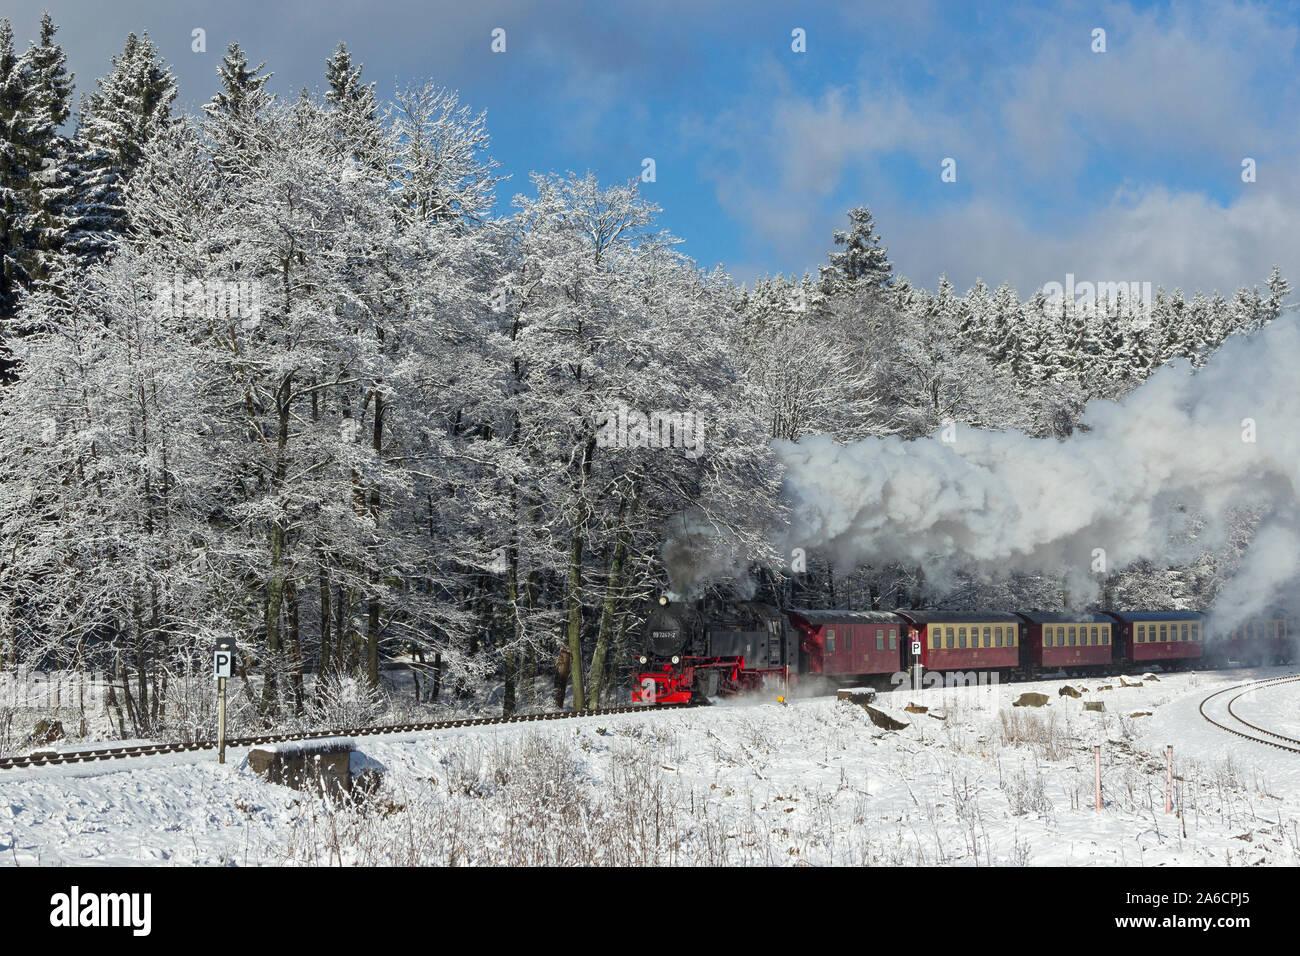 The steam train climbing Brocken Mountain near Drei Annen Hohne in the Harz Mountains, Germany. Stock Photo